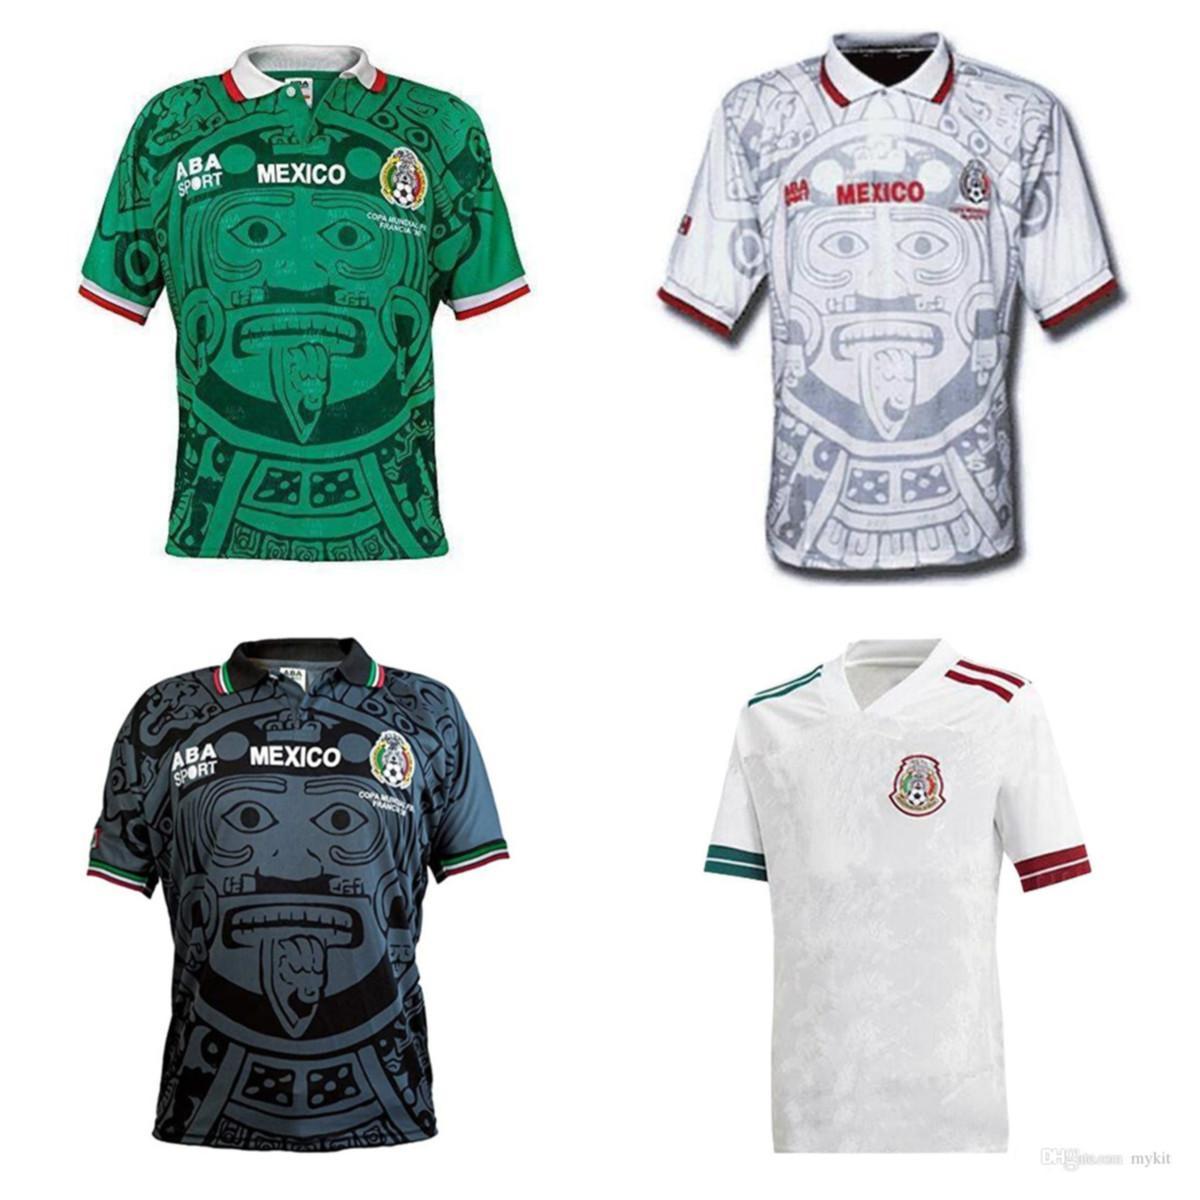 2020 New Mexico White Soccer Jersey National 2019 المكسيك Chicharito Lozano Guardado Carlos Vela Raul Blanco Ramirez Soccer Jersey